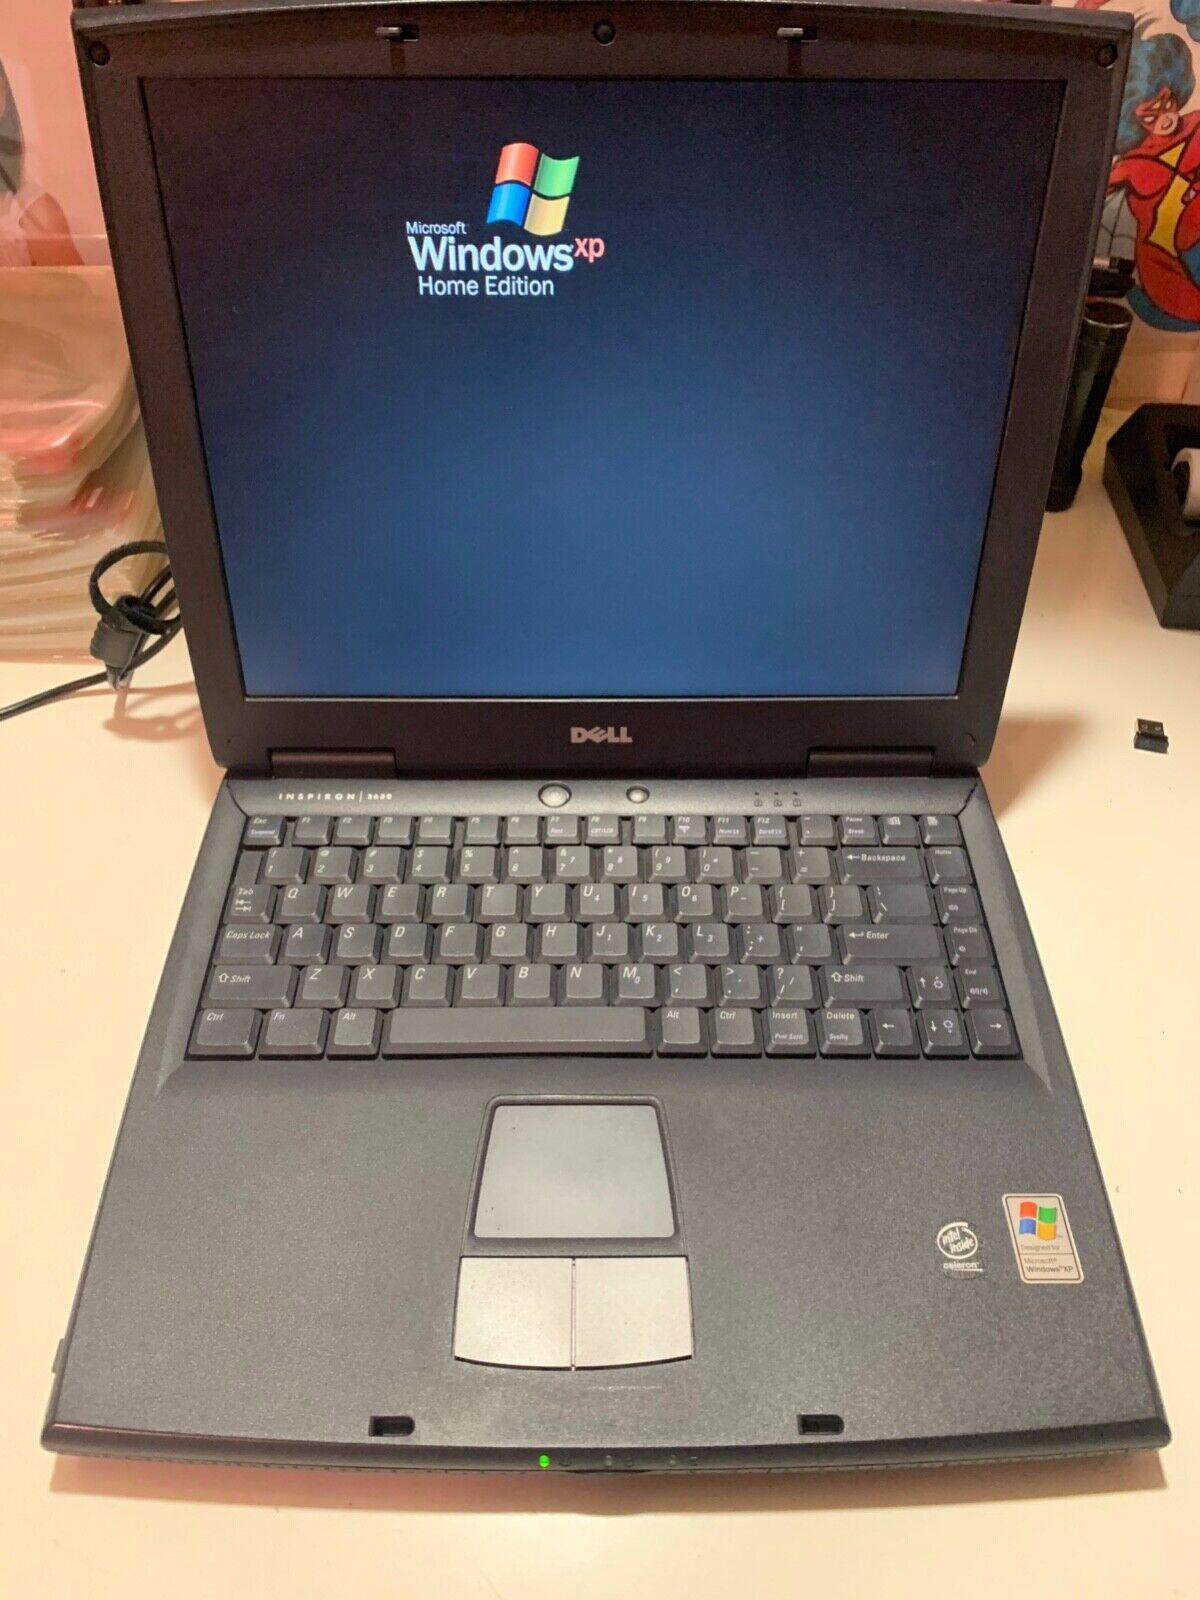 Laptop Windows - DELL  INSPIRON  2650  WINDOWS  XP  HOME EDITION LAPTOP